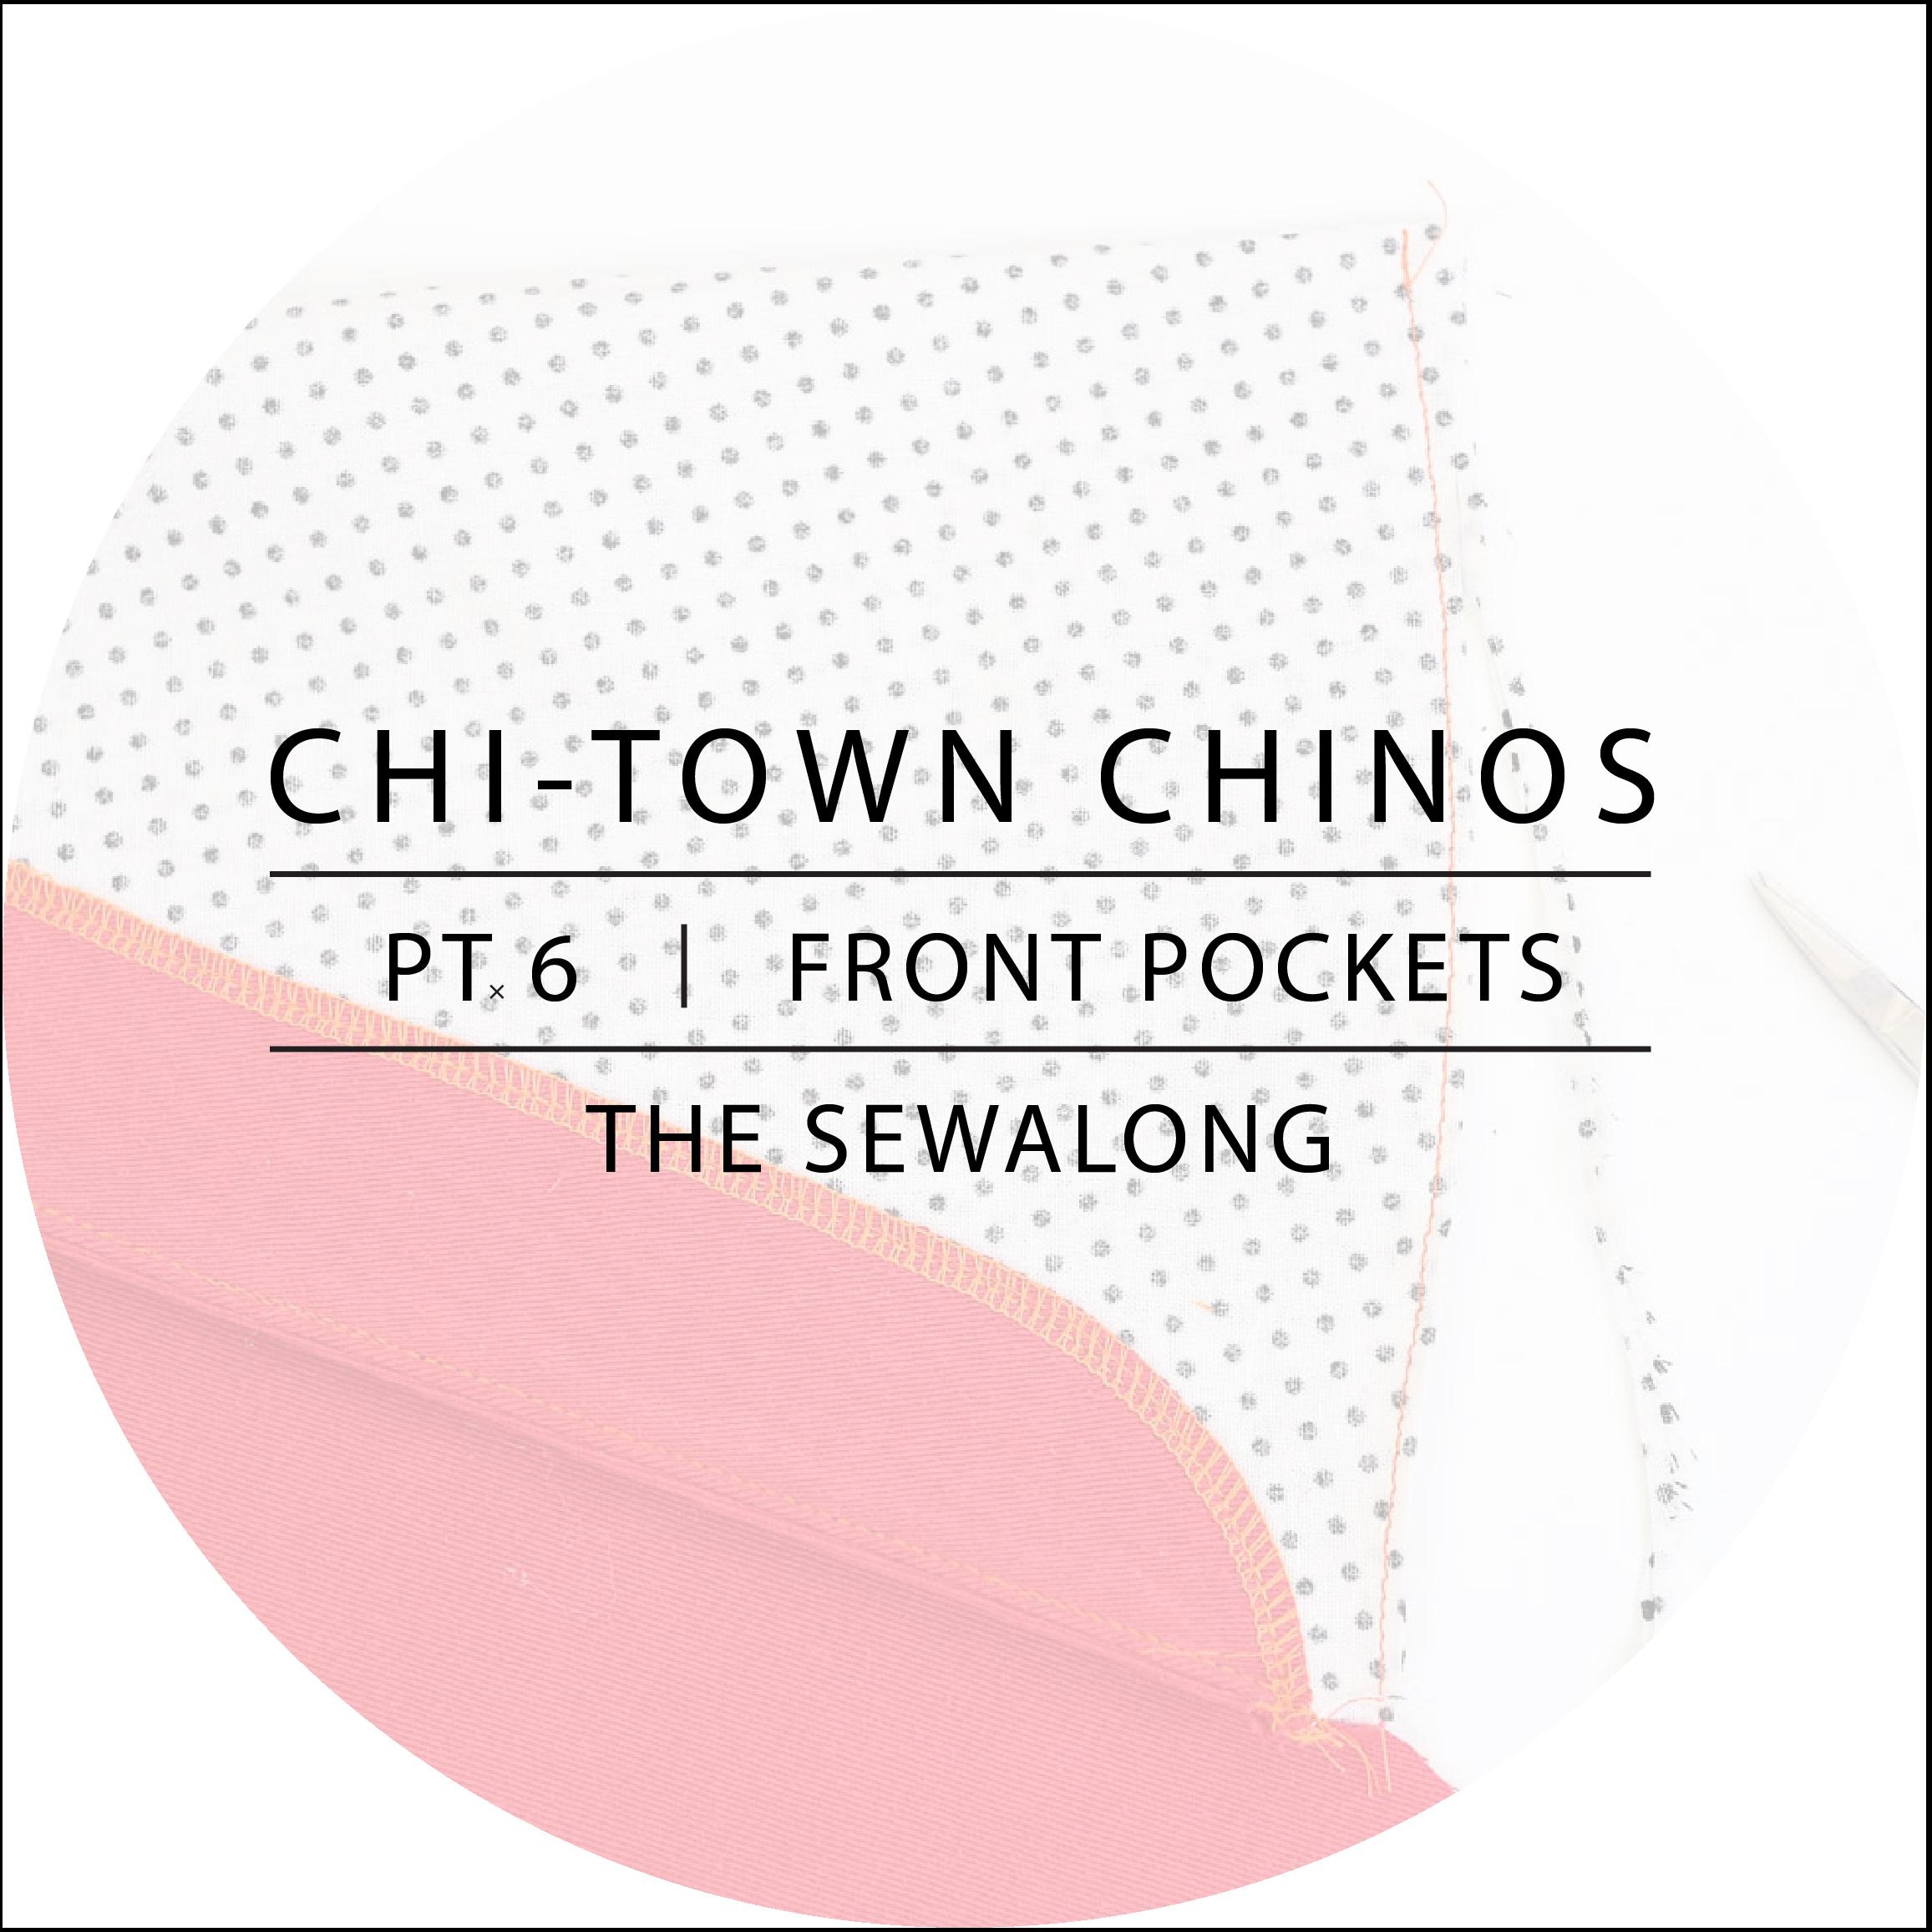 Chi-Town Chinos Sewalong Pt 6